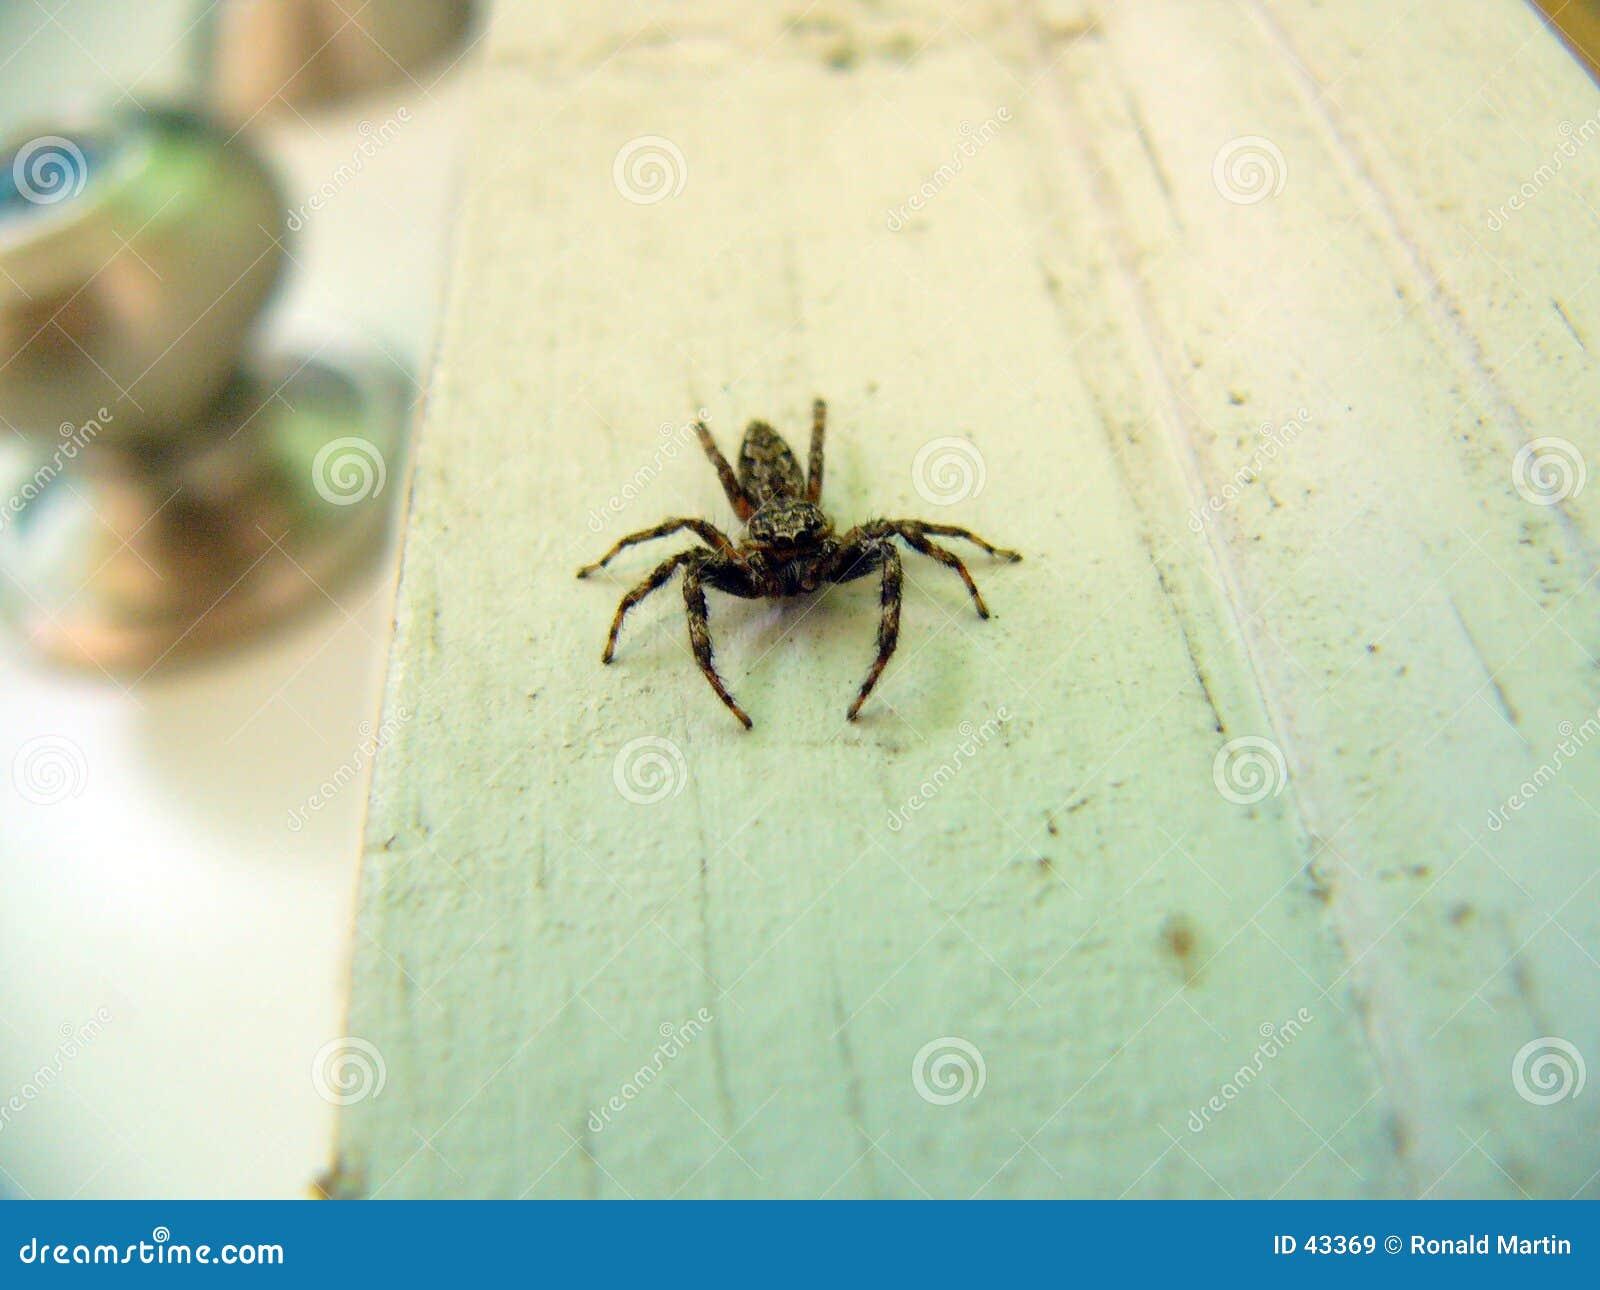 Spider scarry